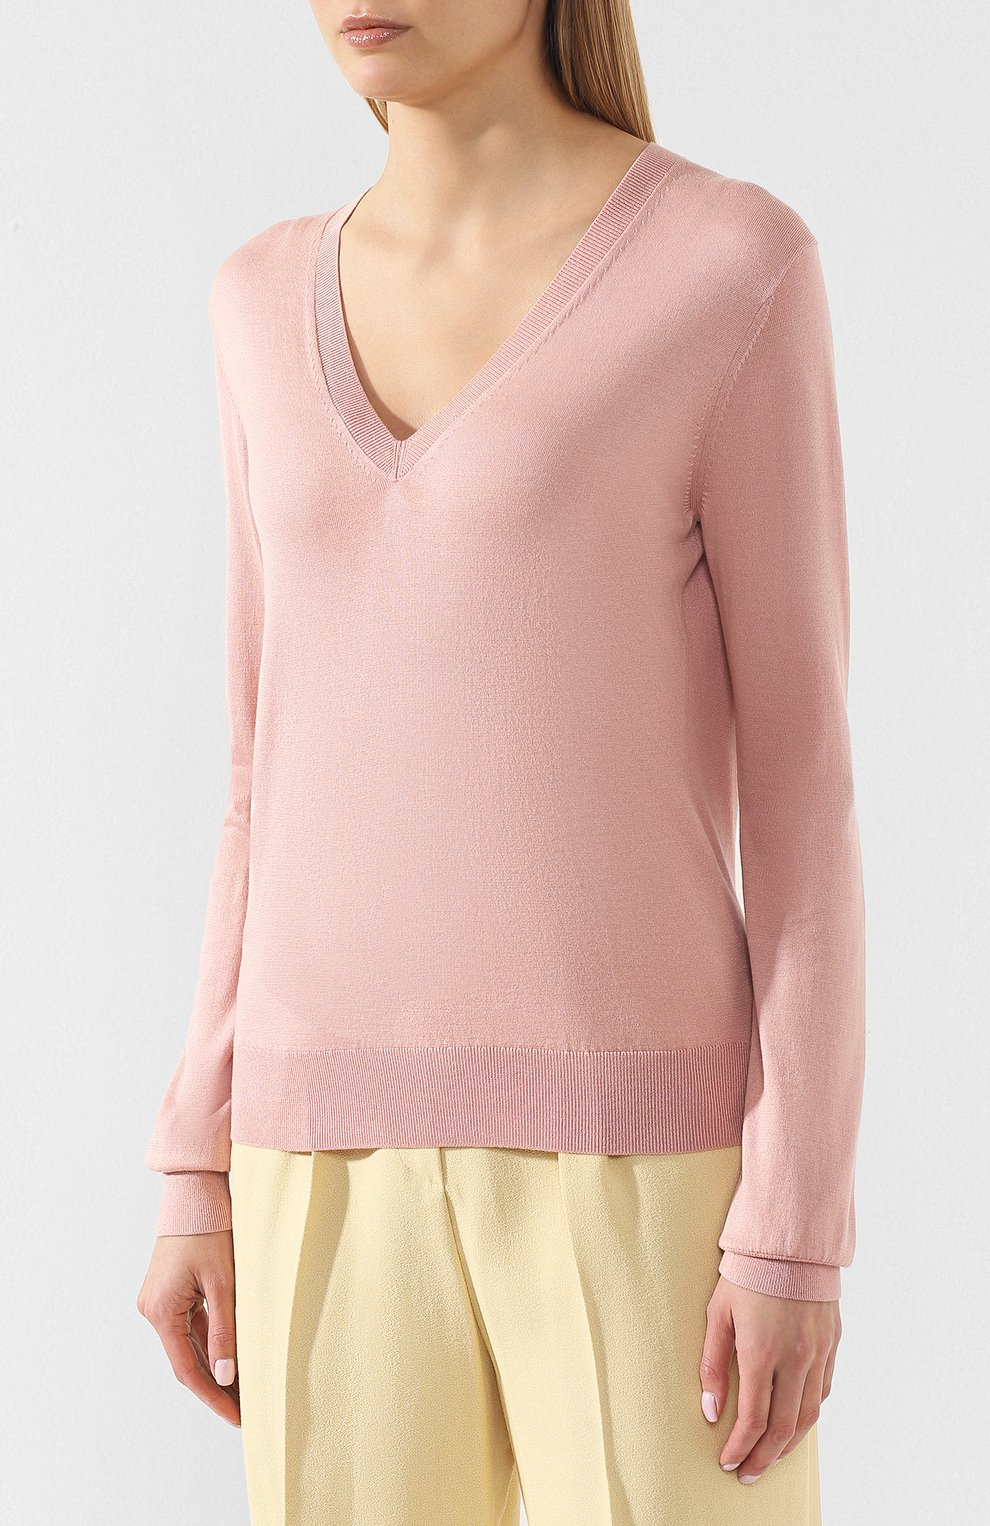 e26fd994e0d5 Пуловер из смеси шелка и хлопка